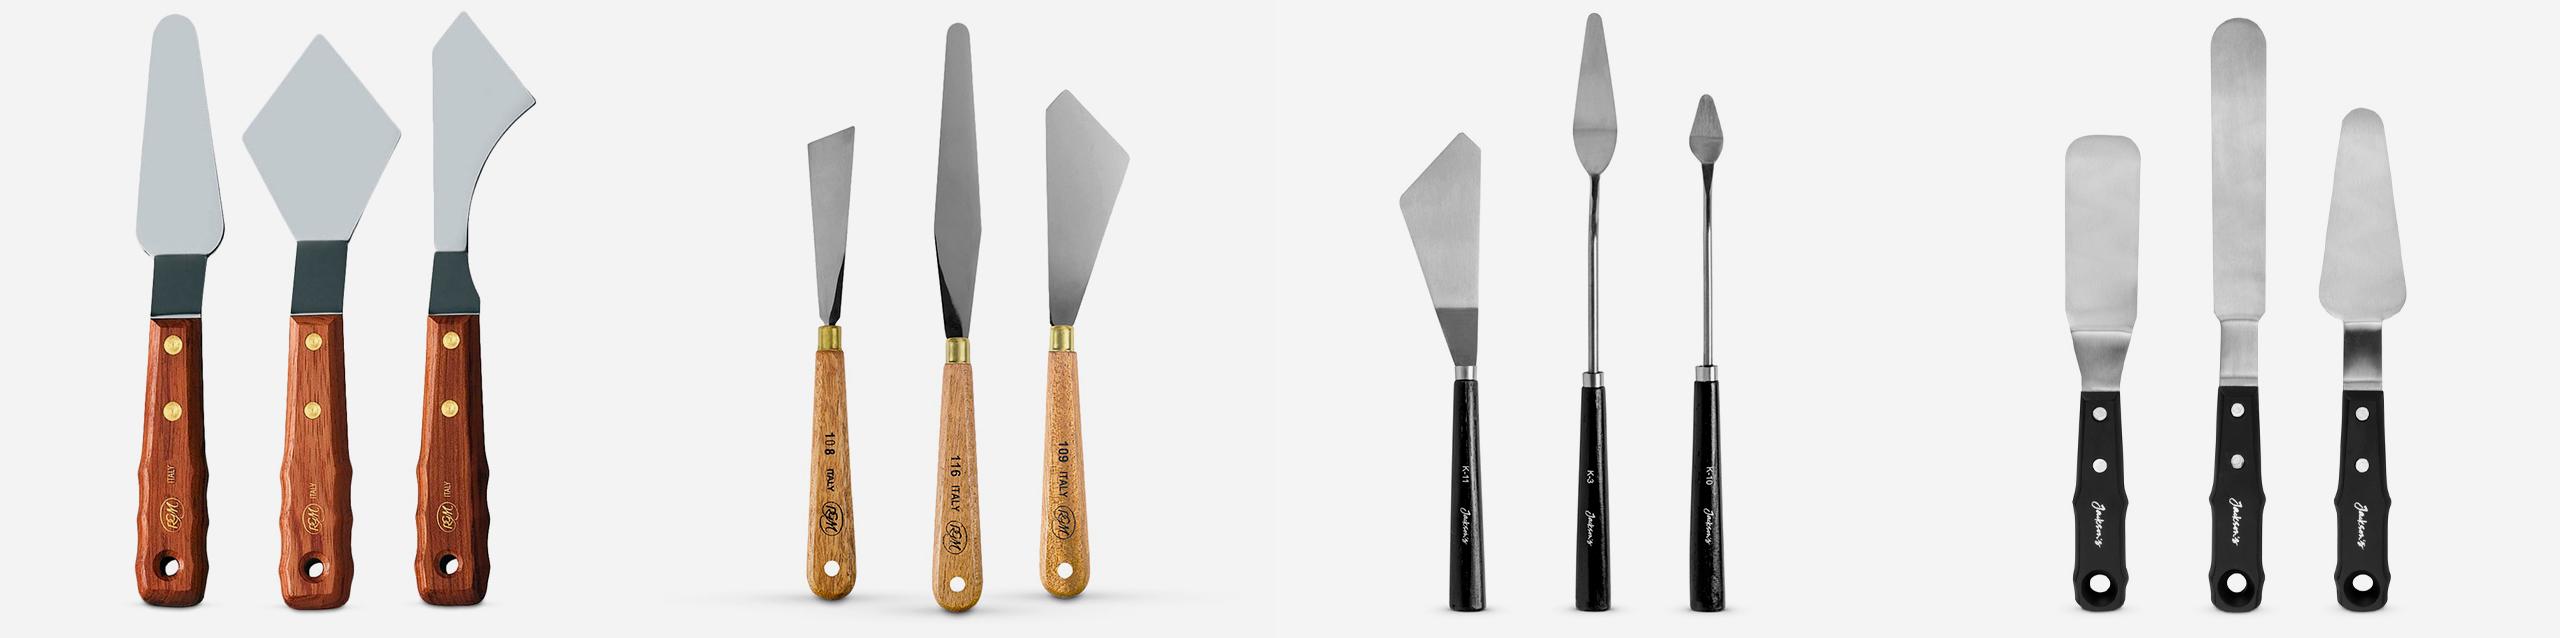 L-R: RGM Extra Large Palette Knives, RGM Palette Knives, Jackson's Extra Offset Crank Painting knives, Jackson's XXL Painting knives